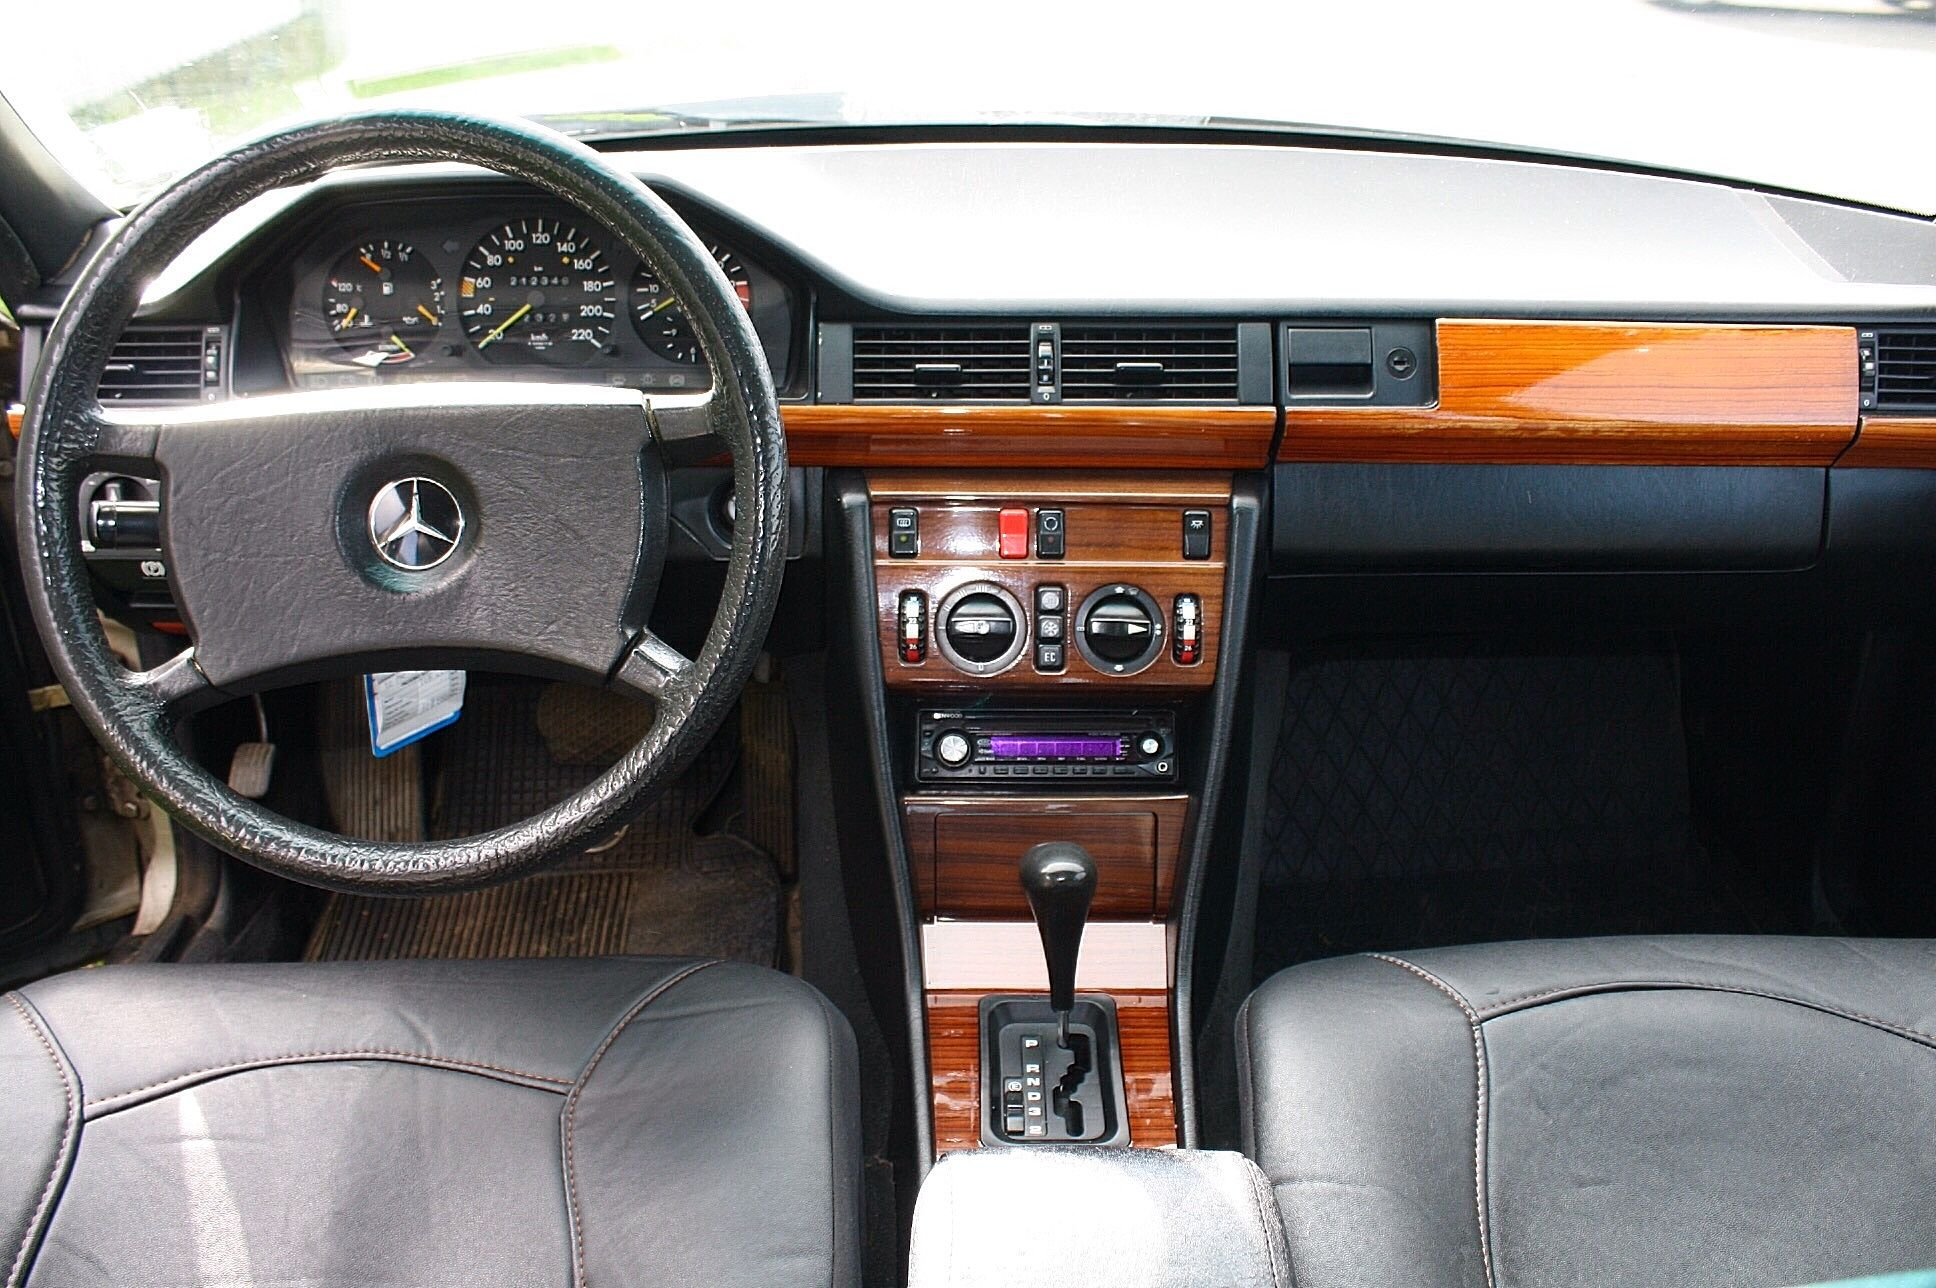 Mercedes Benz 230e Interior Dashboard Mercedes Benz Mercedes